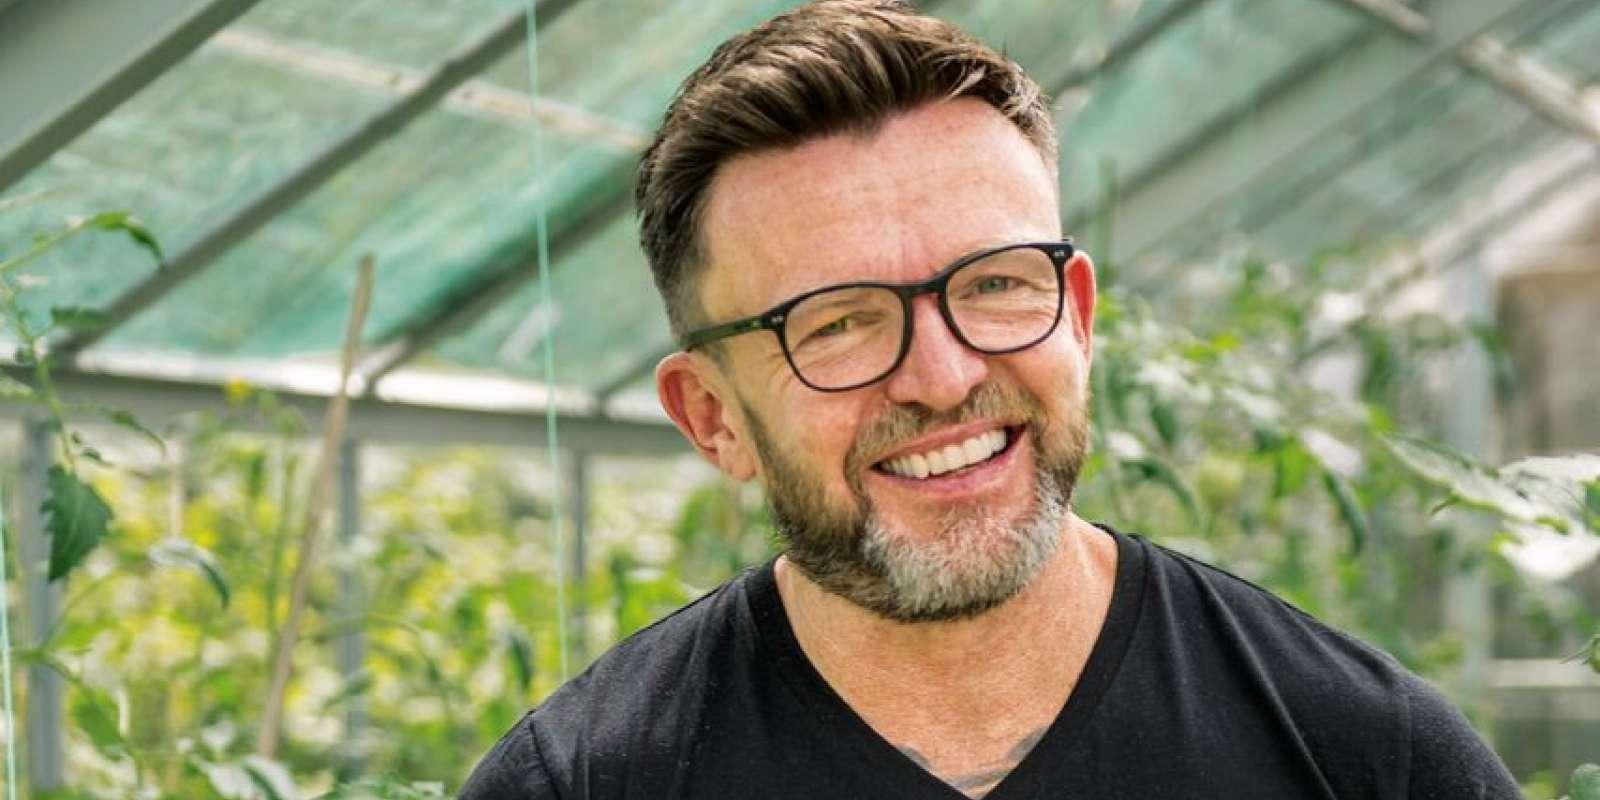 Darren Lovell in his organic vegetable garden